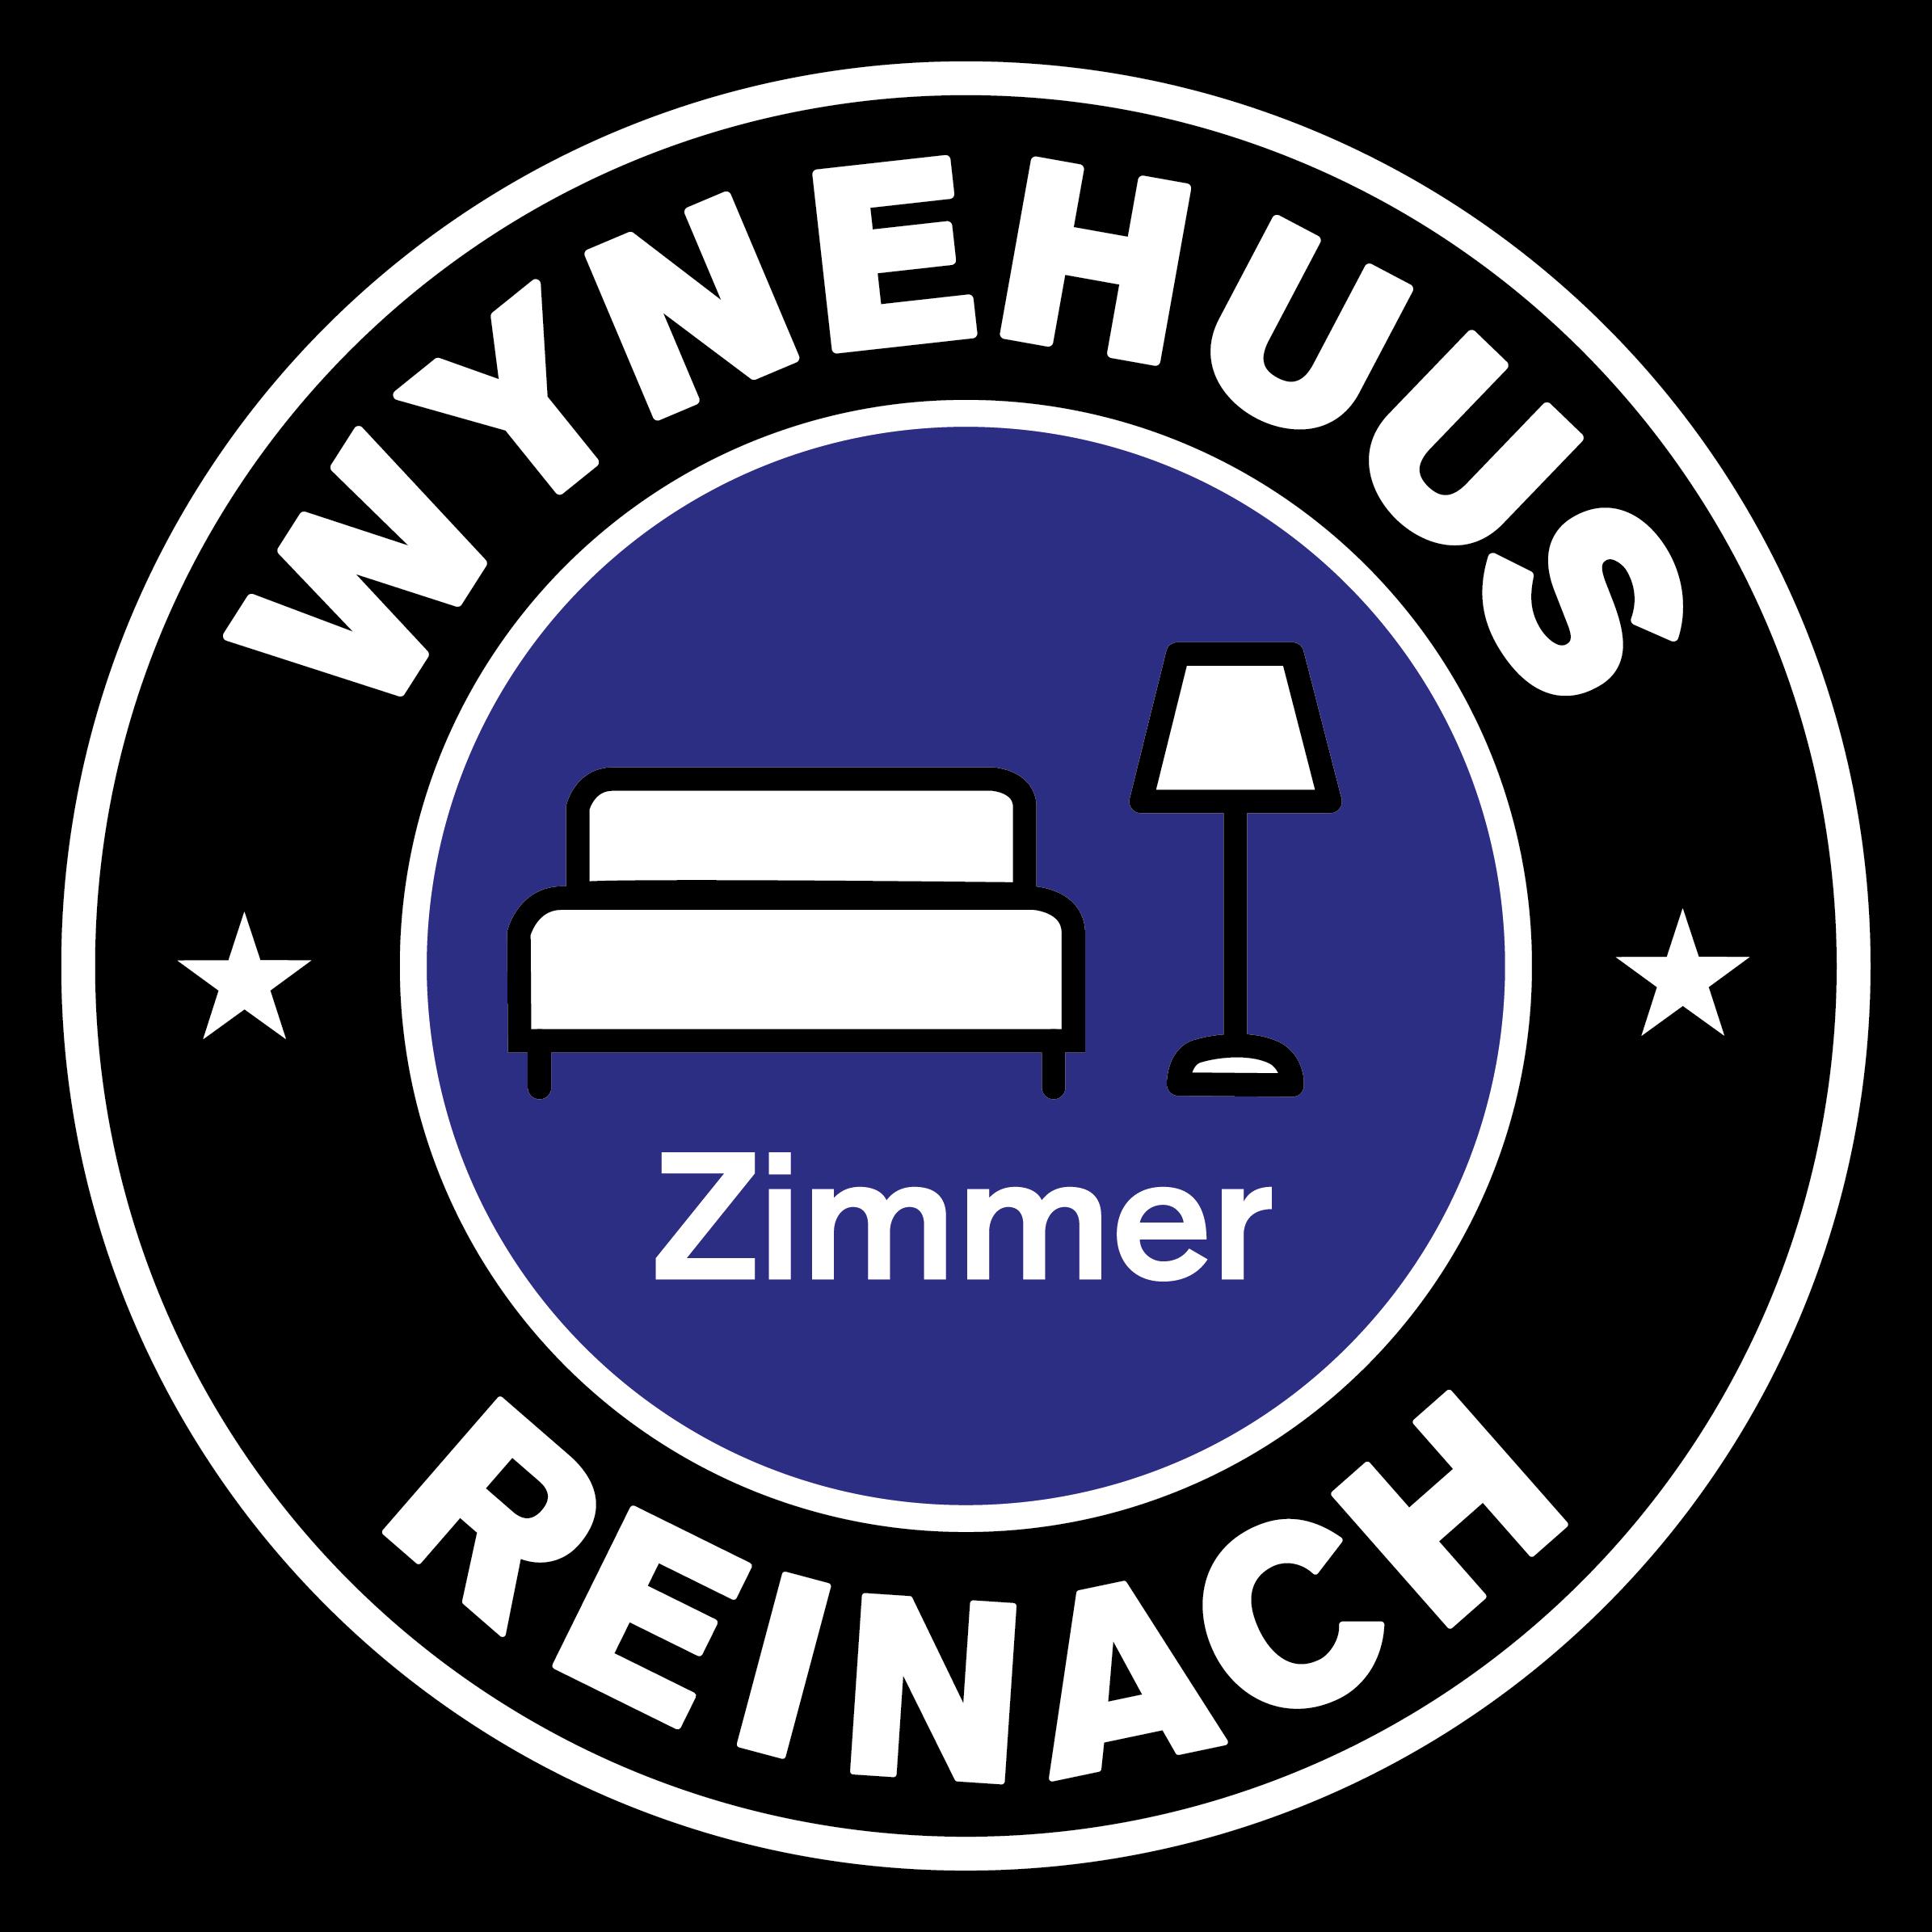 Wynehuus_Zimmer